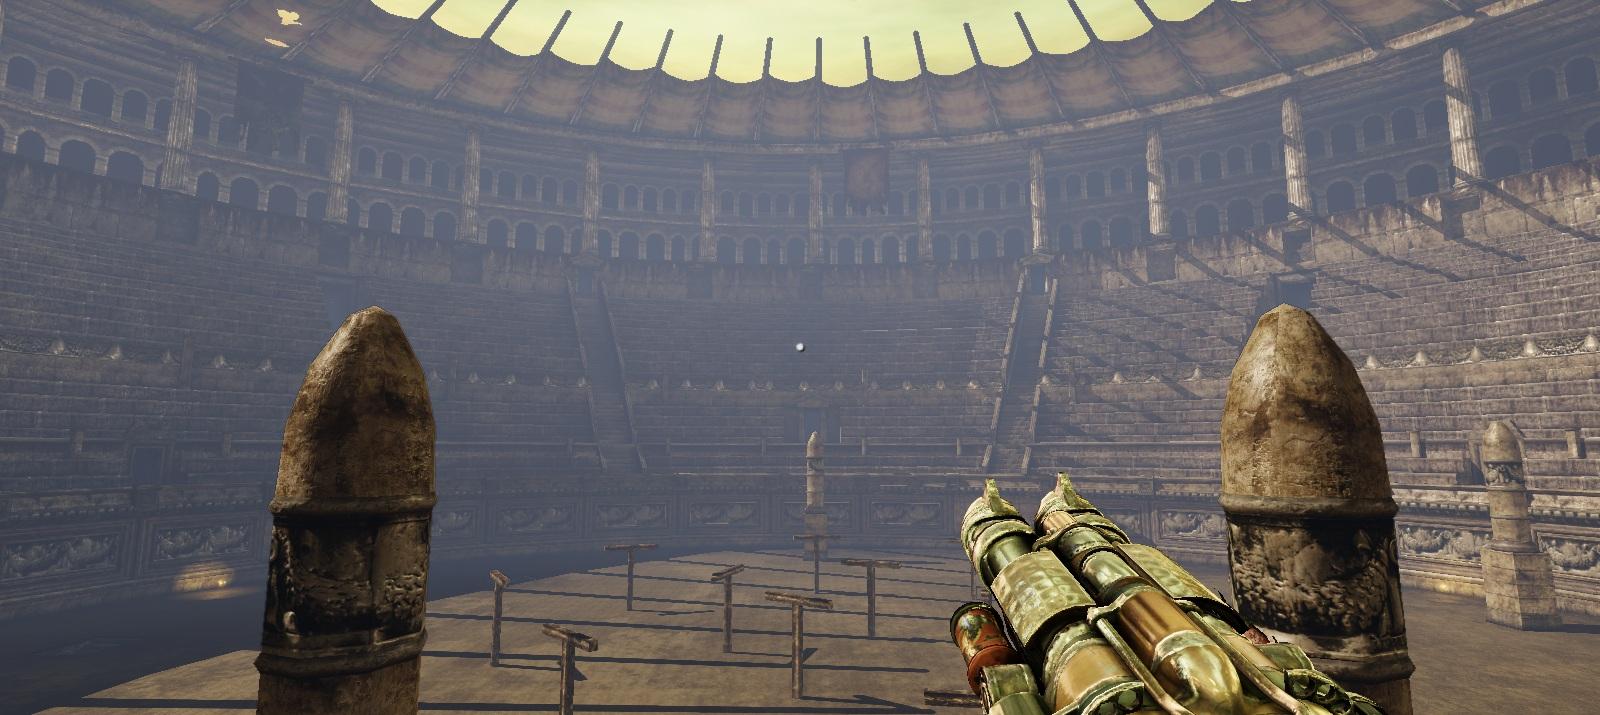 12. Koloseum